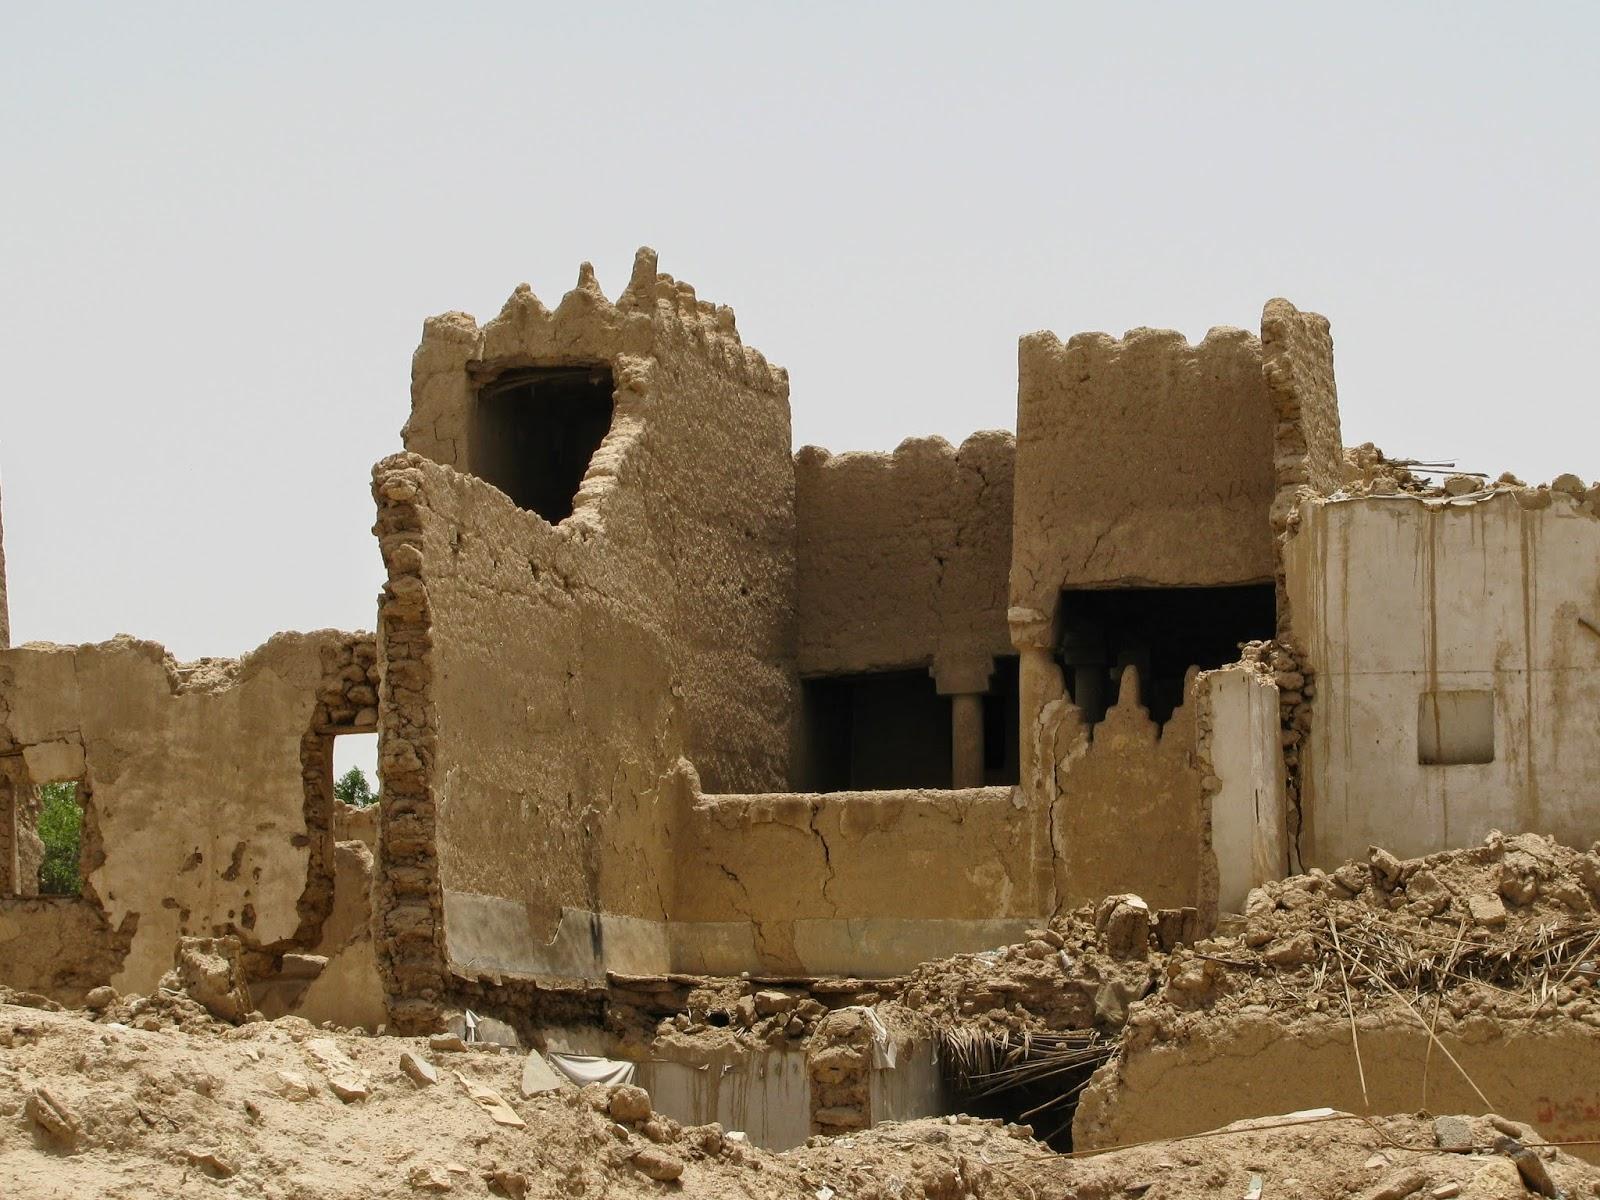 The mud houses of old riyadh